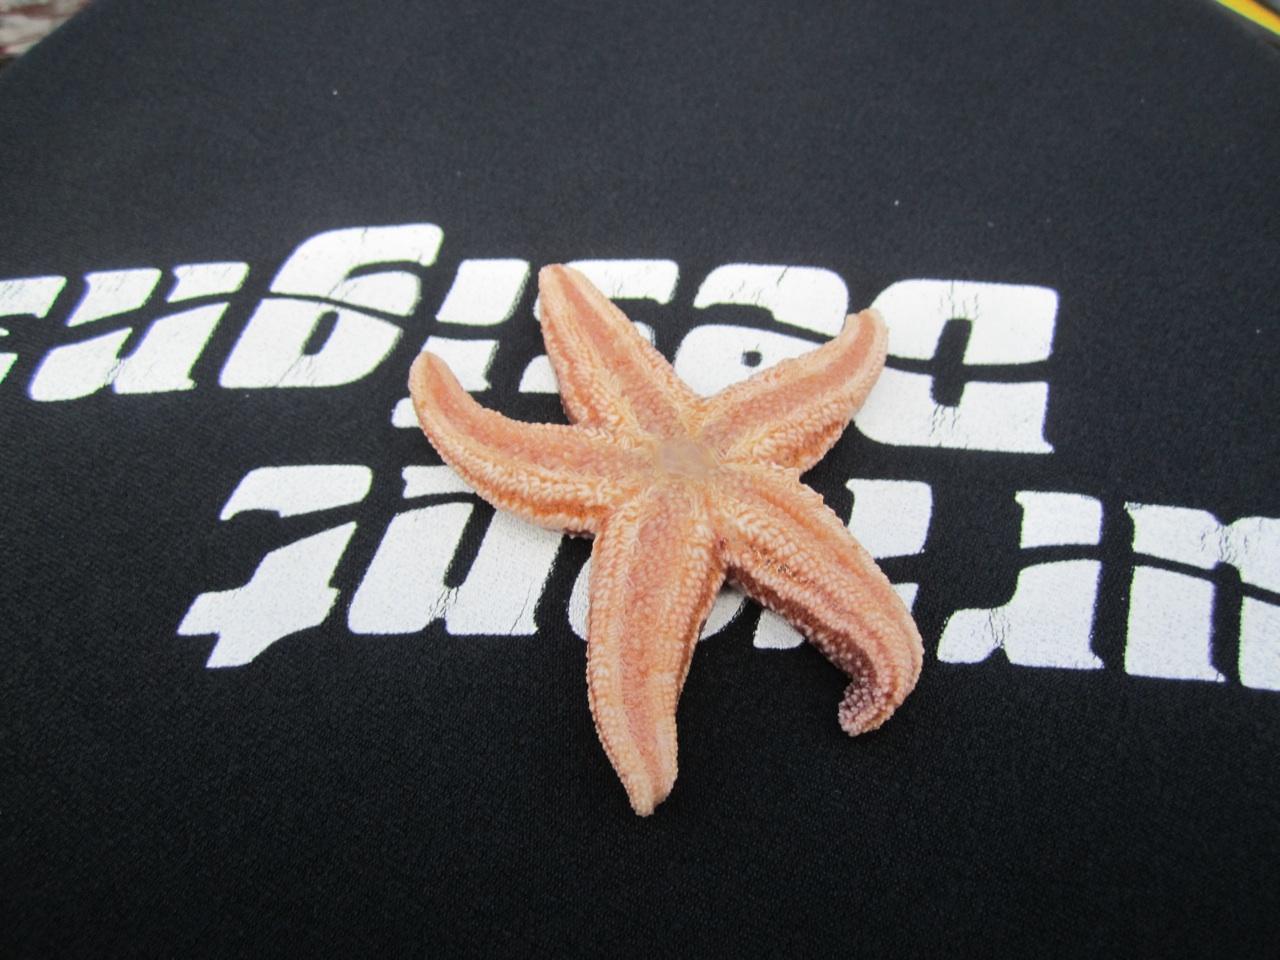 One Of The Starfish